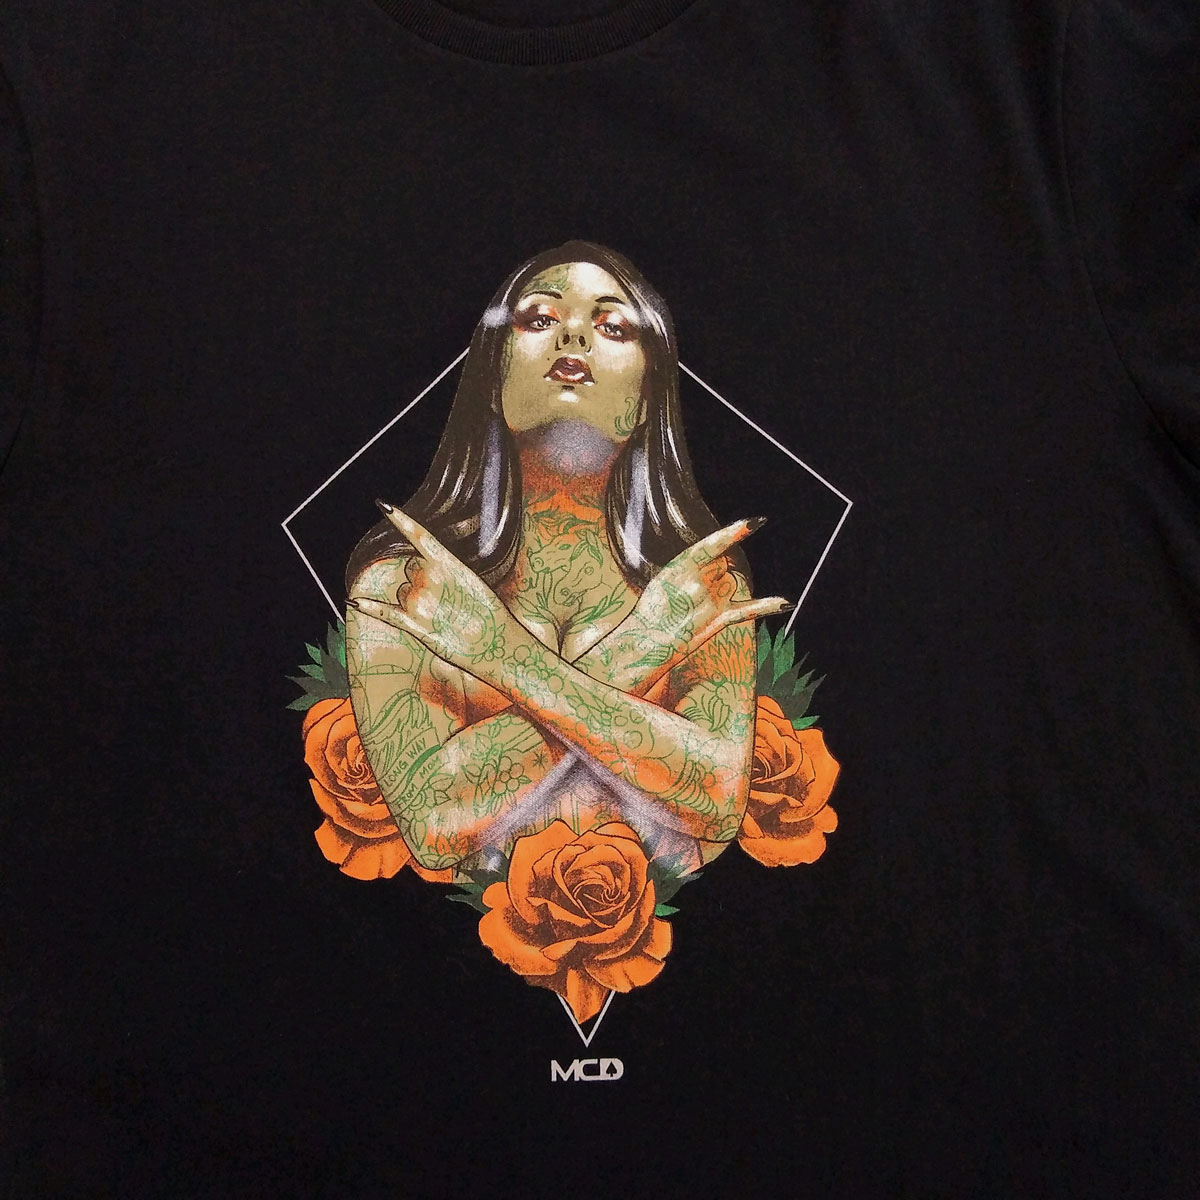 Camiseta MCD Tatto Girl Preta